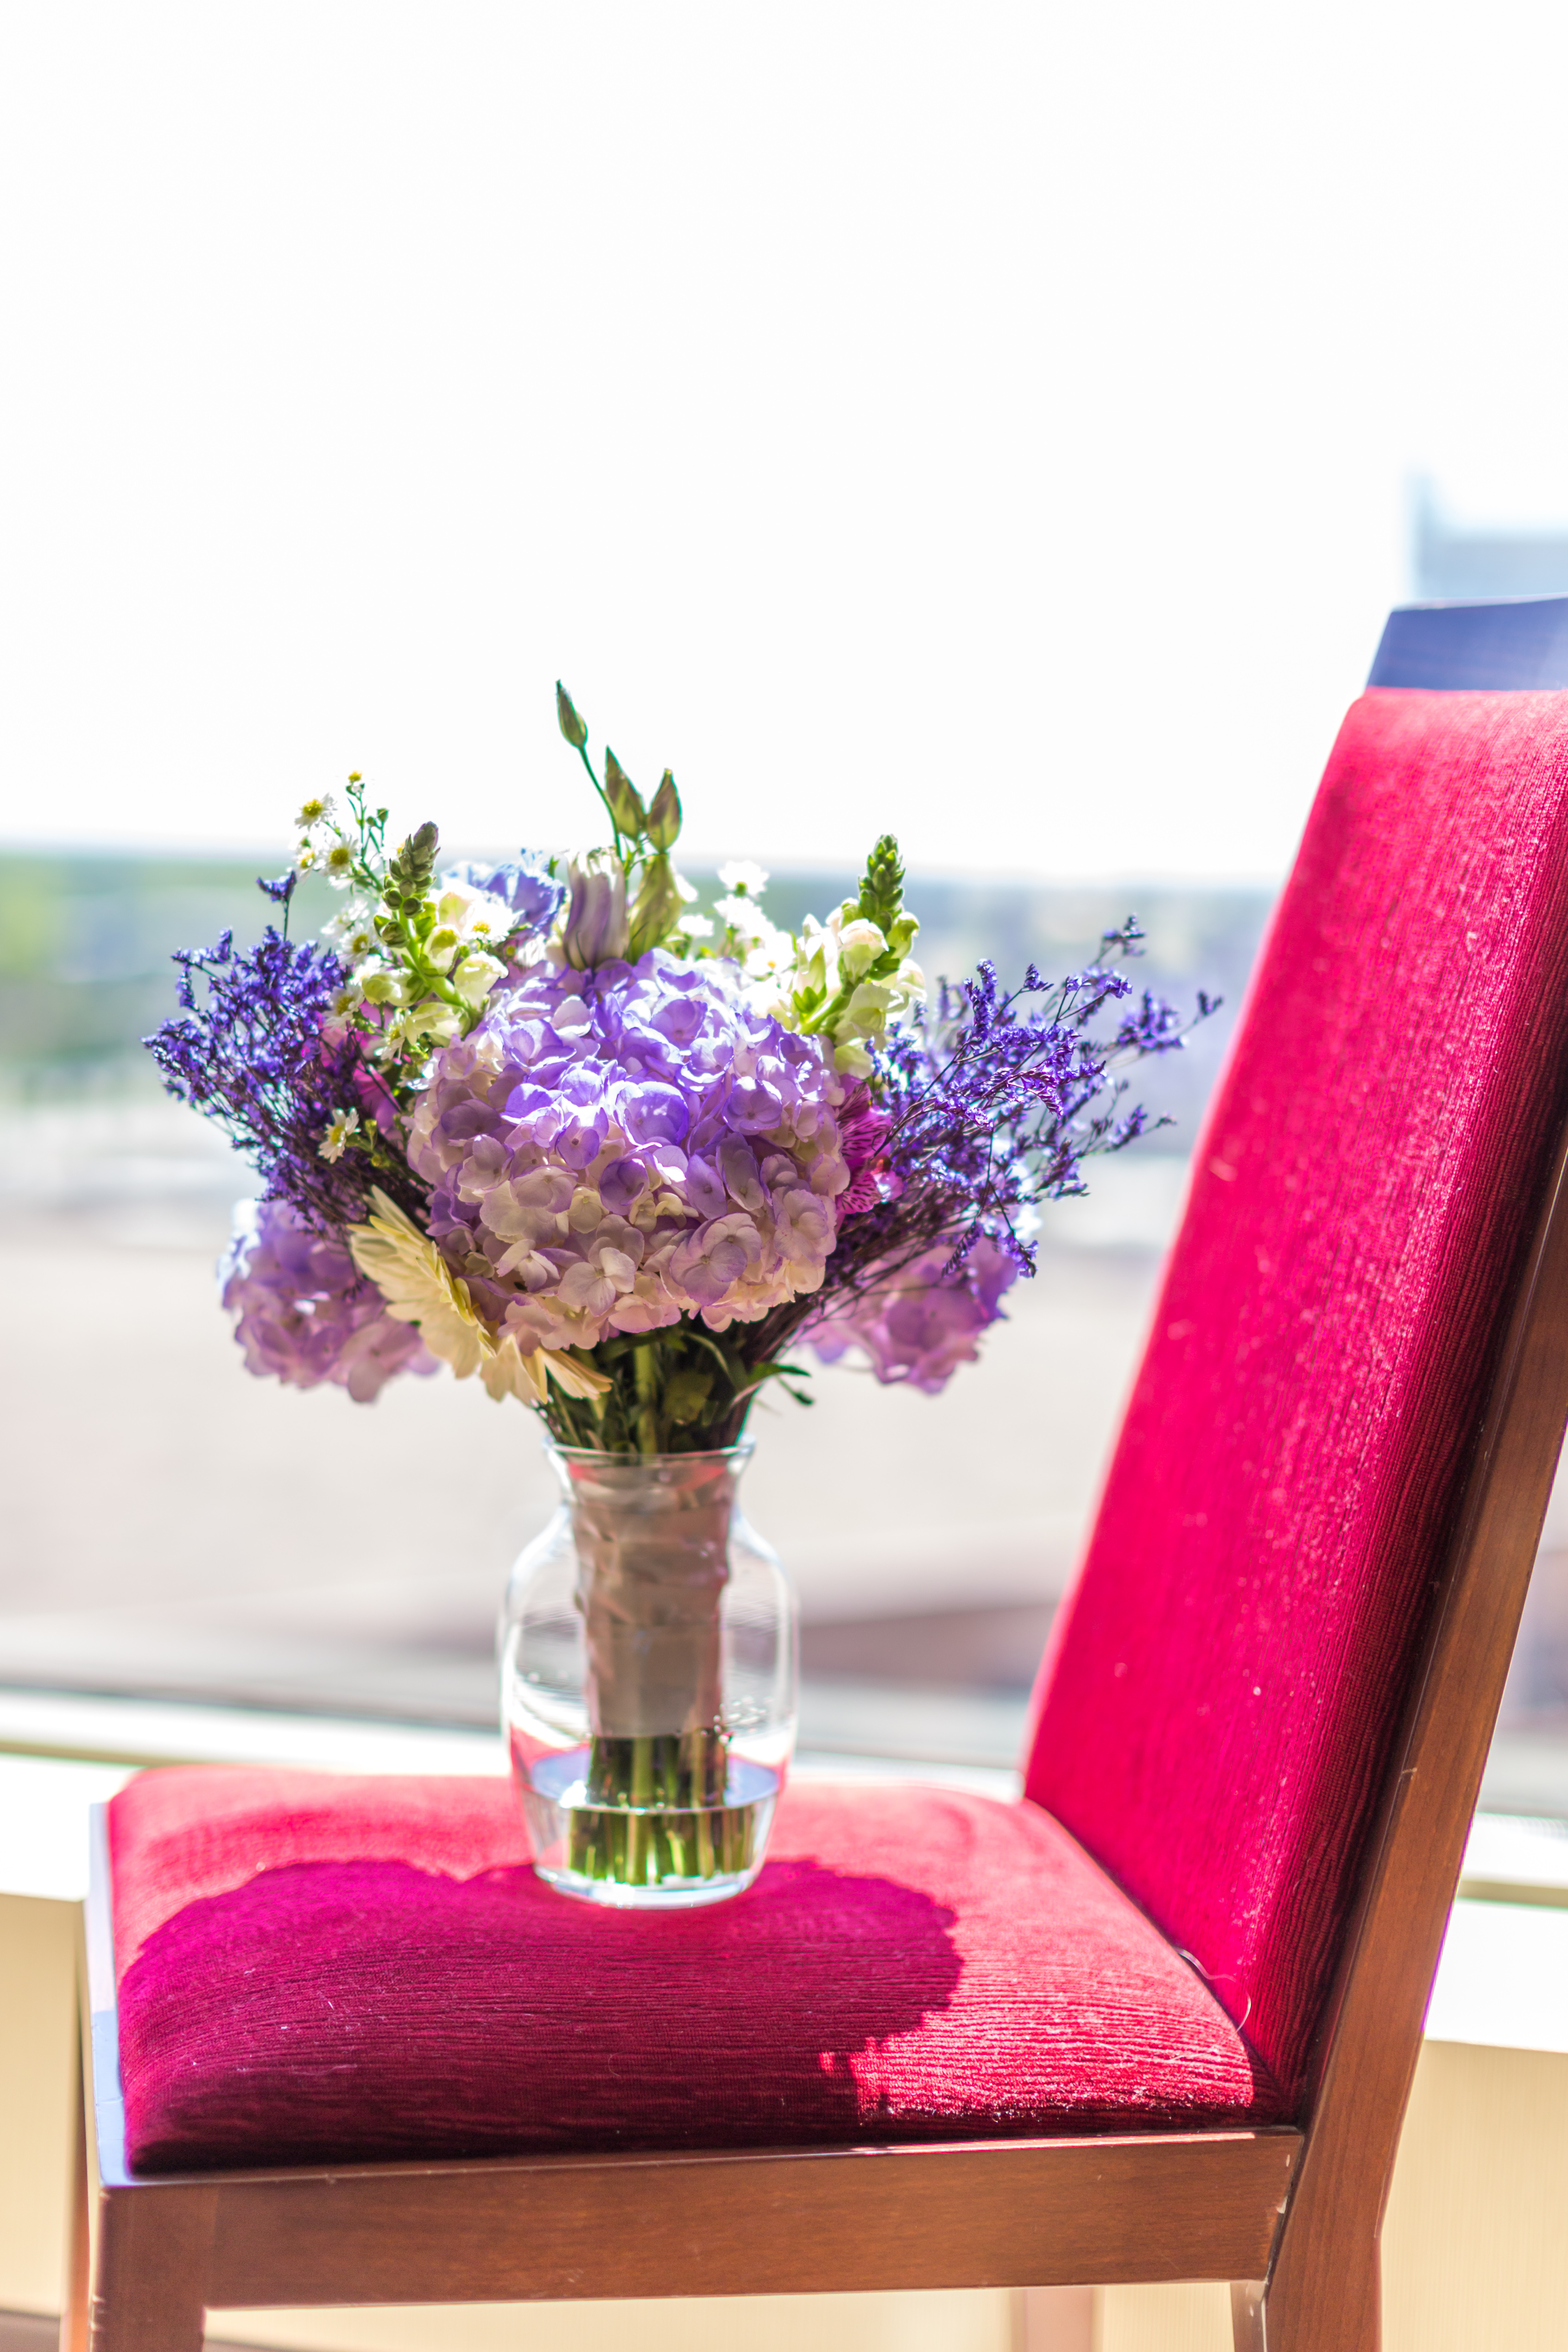 Purple hydrangea bridal bouquet at the Charlotte Hilton Center City.